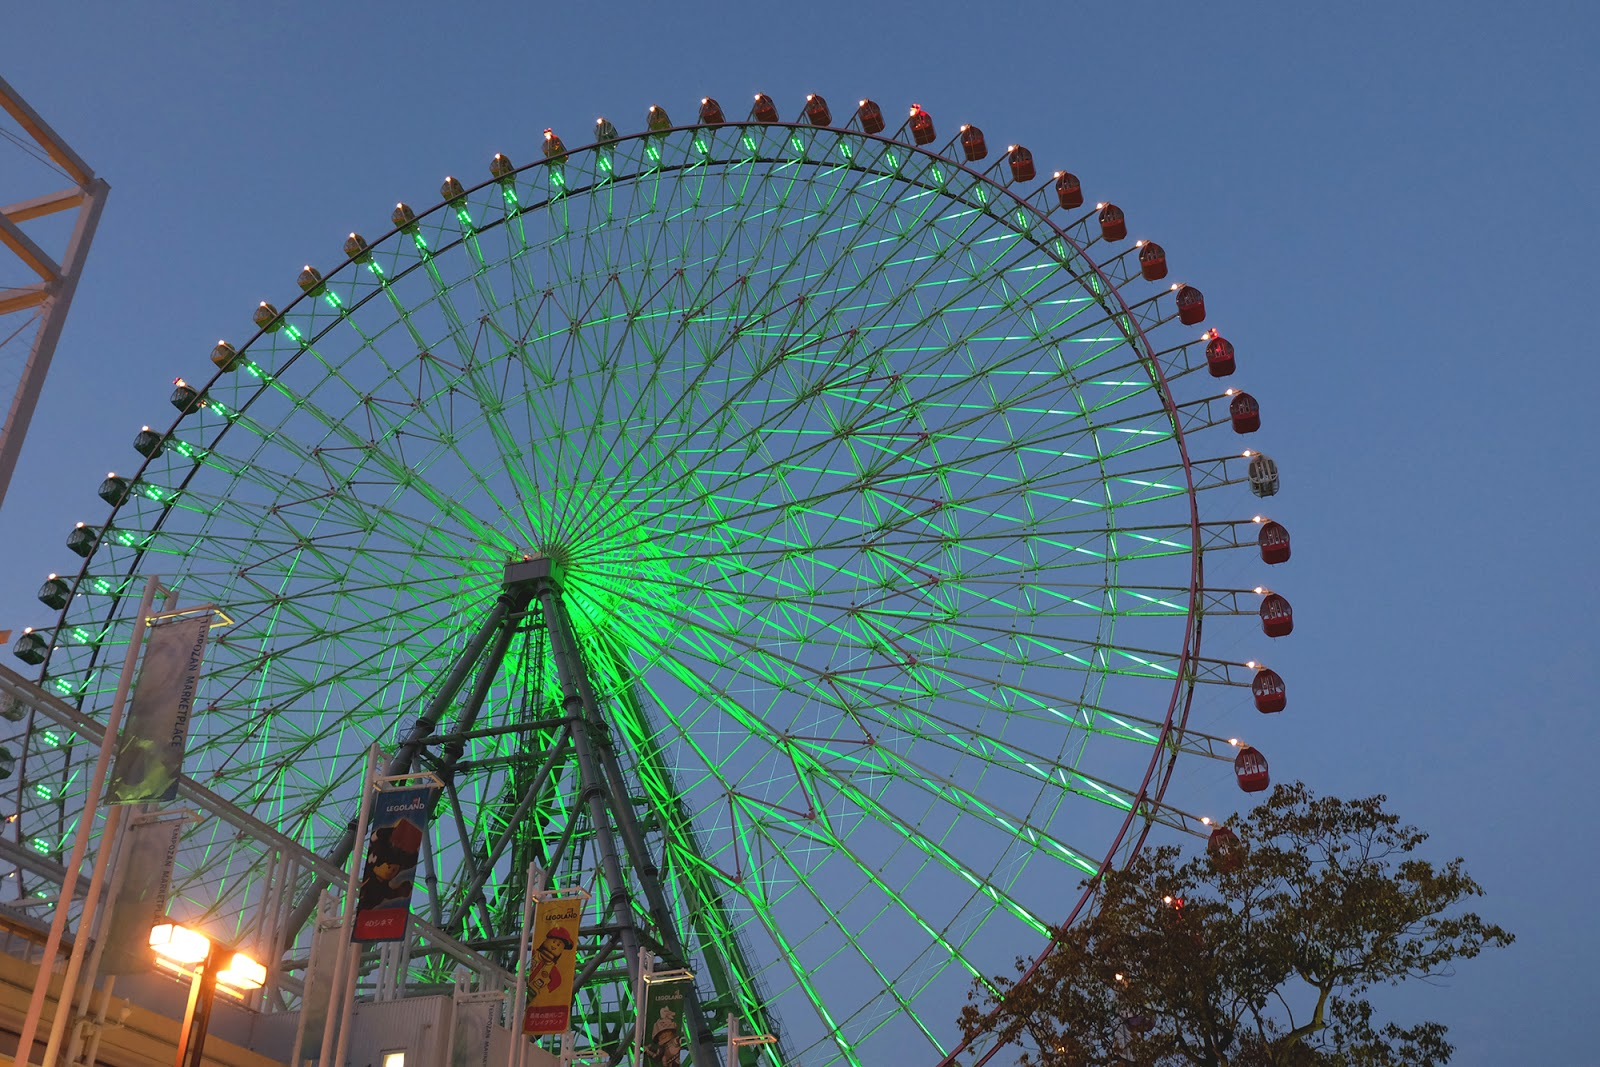 Tempozan Ferris Wheel Osaka | www.bigdreamerblog.com